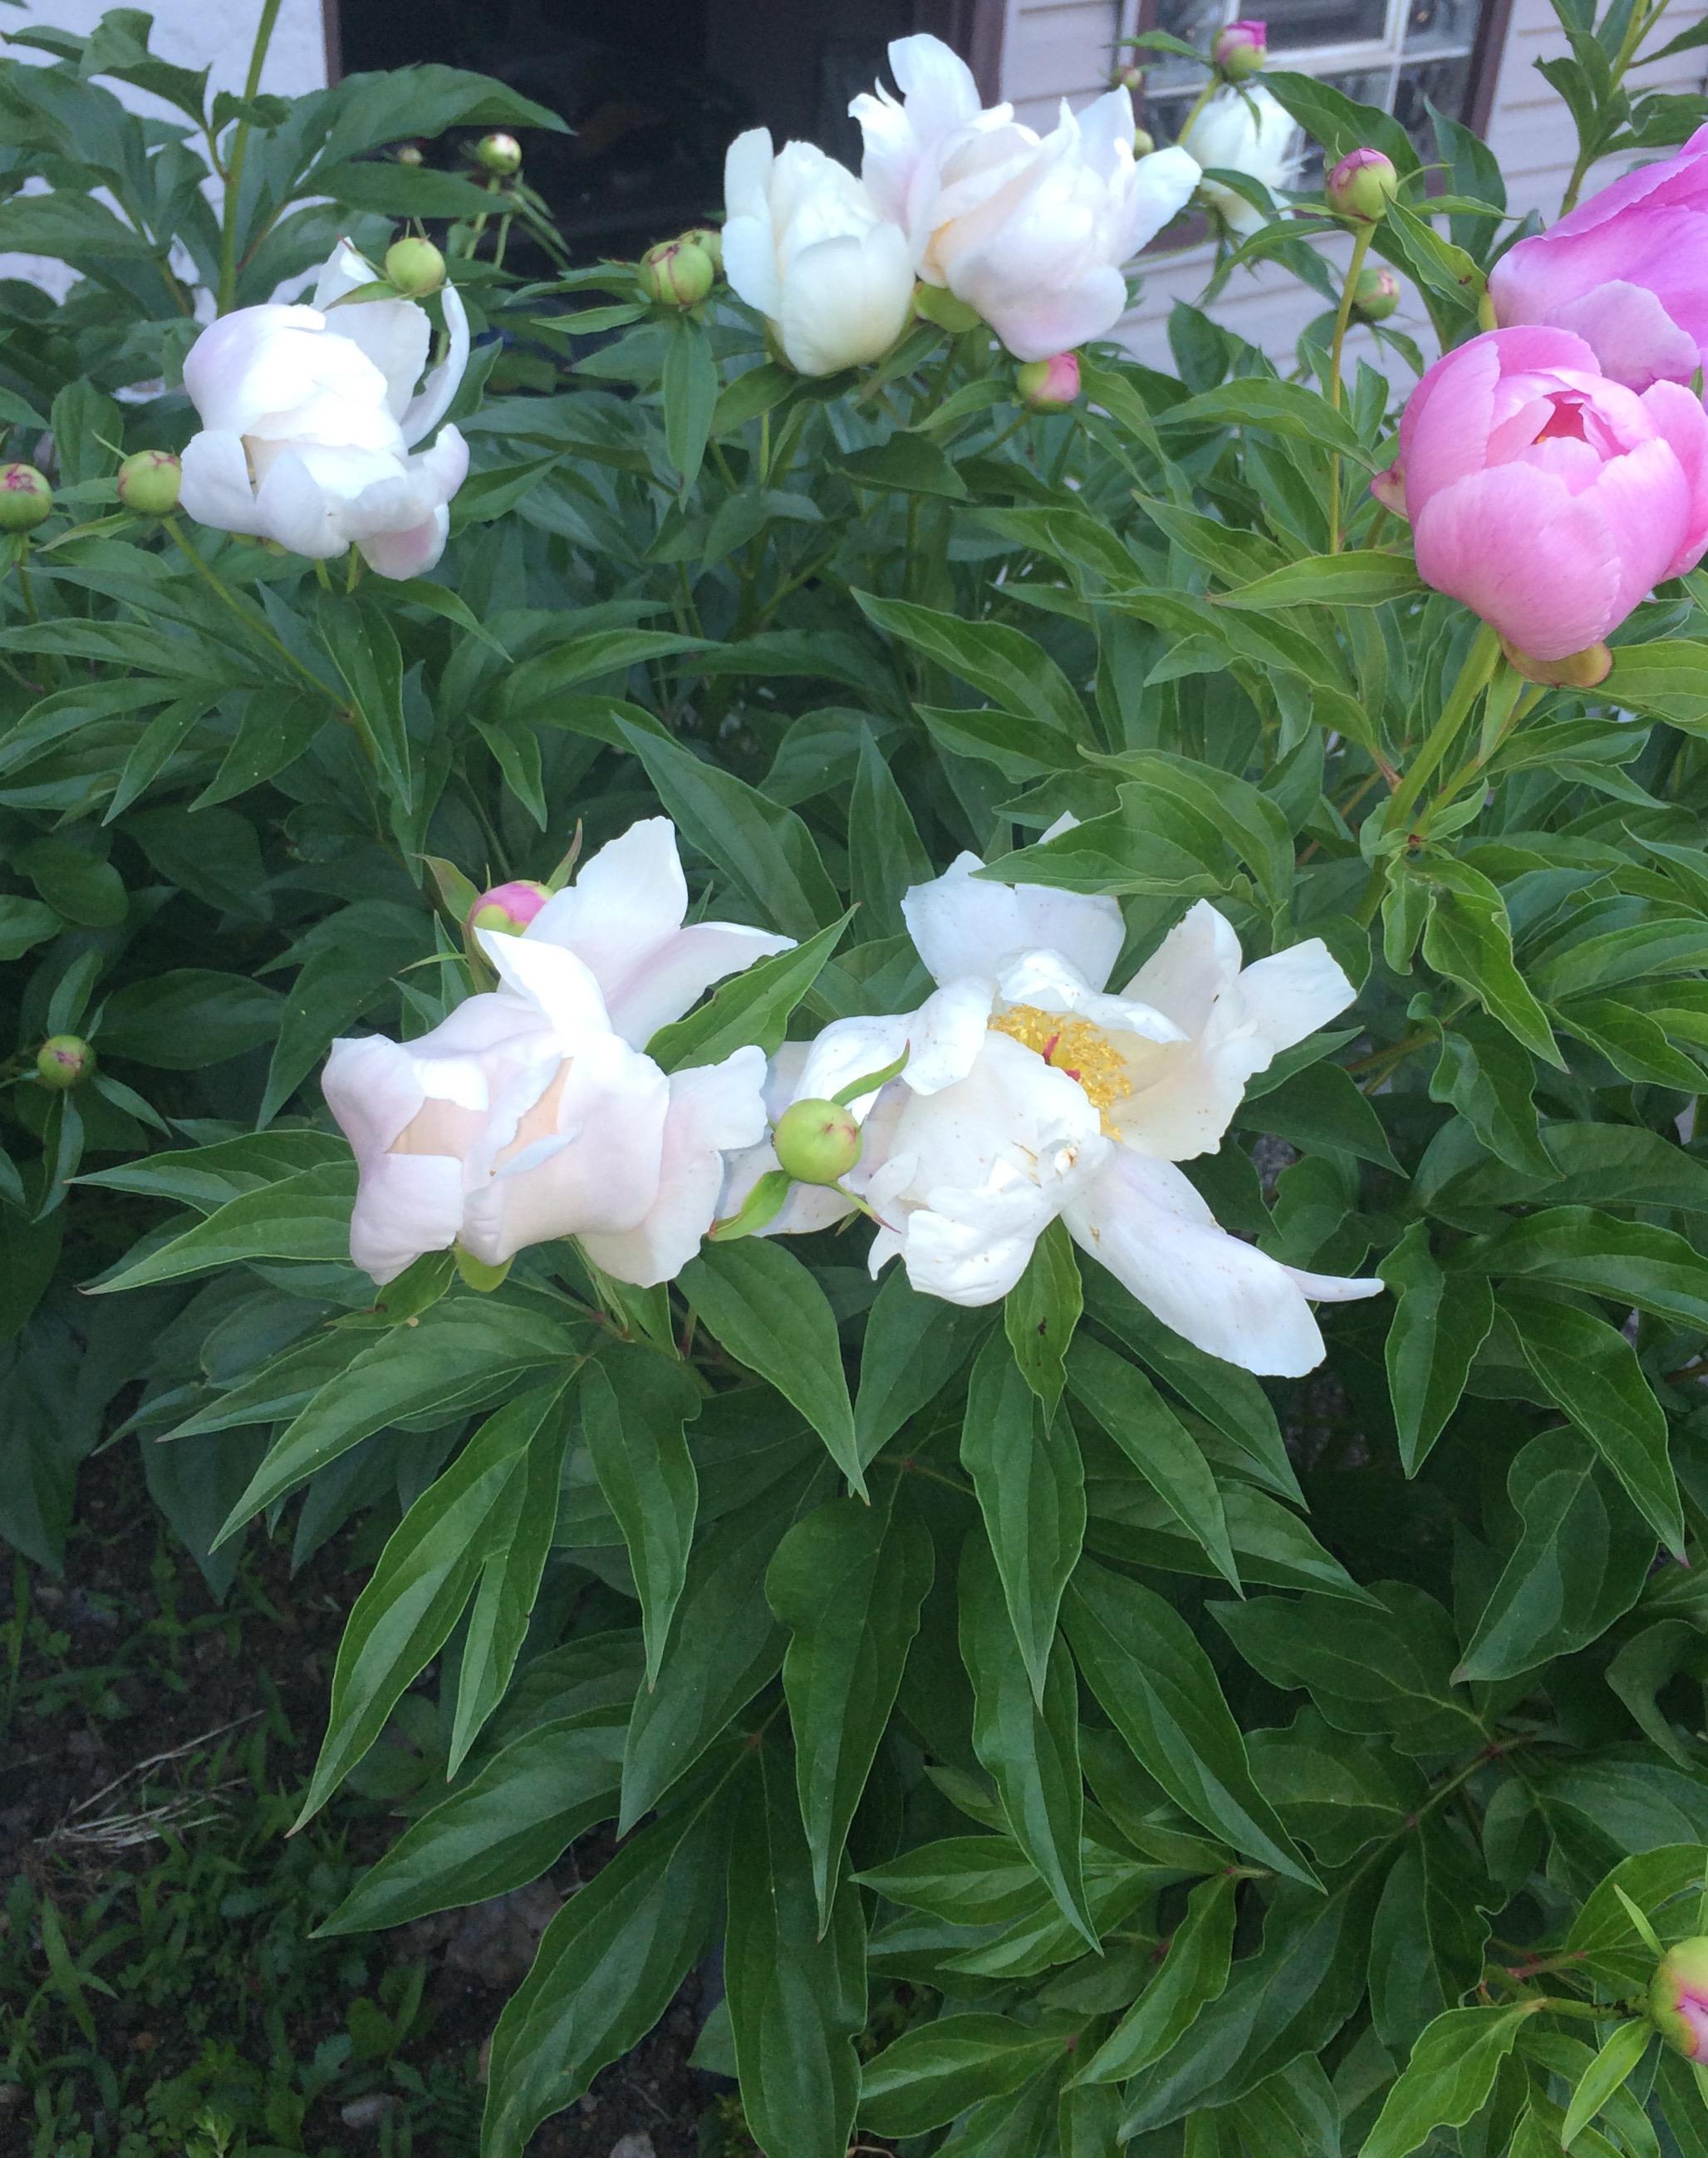 Life is a journery_flower garden